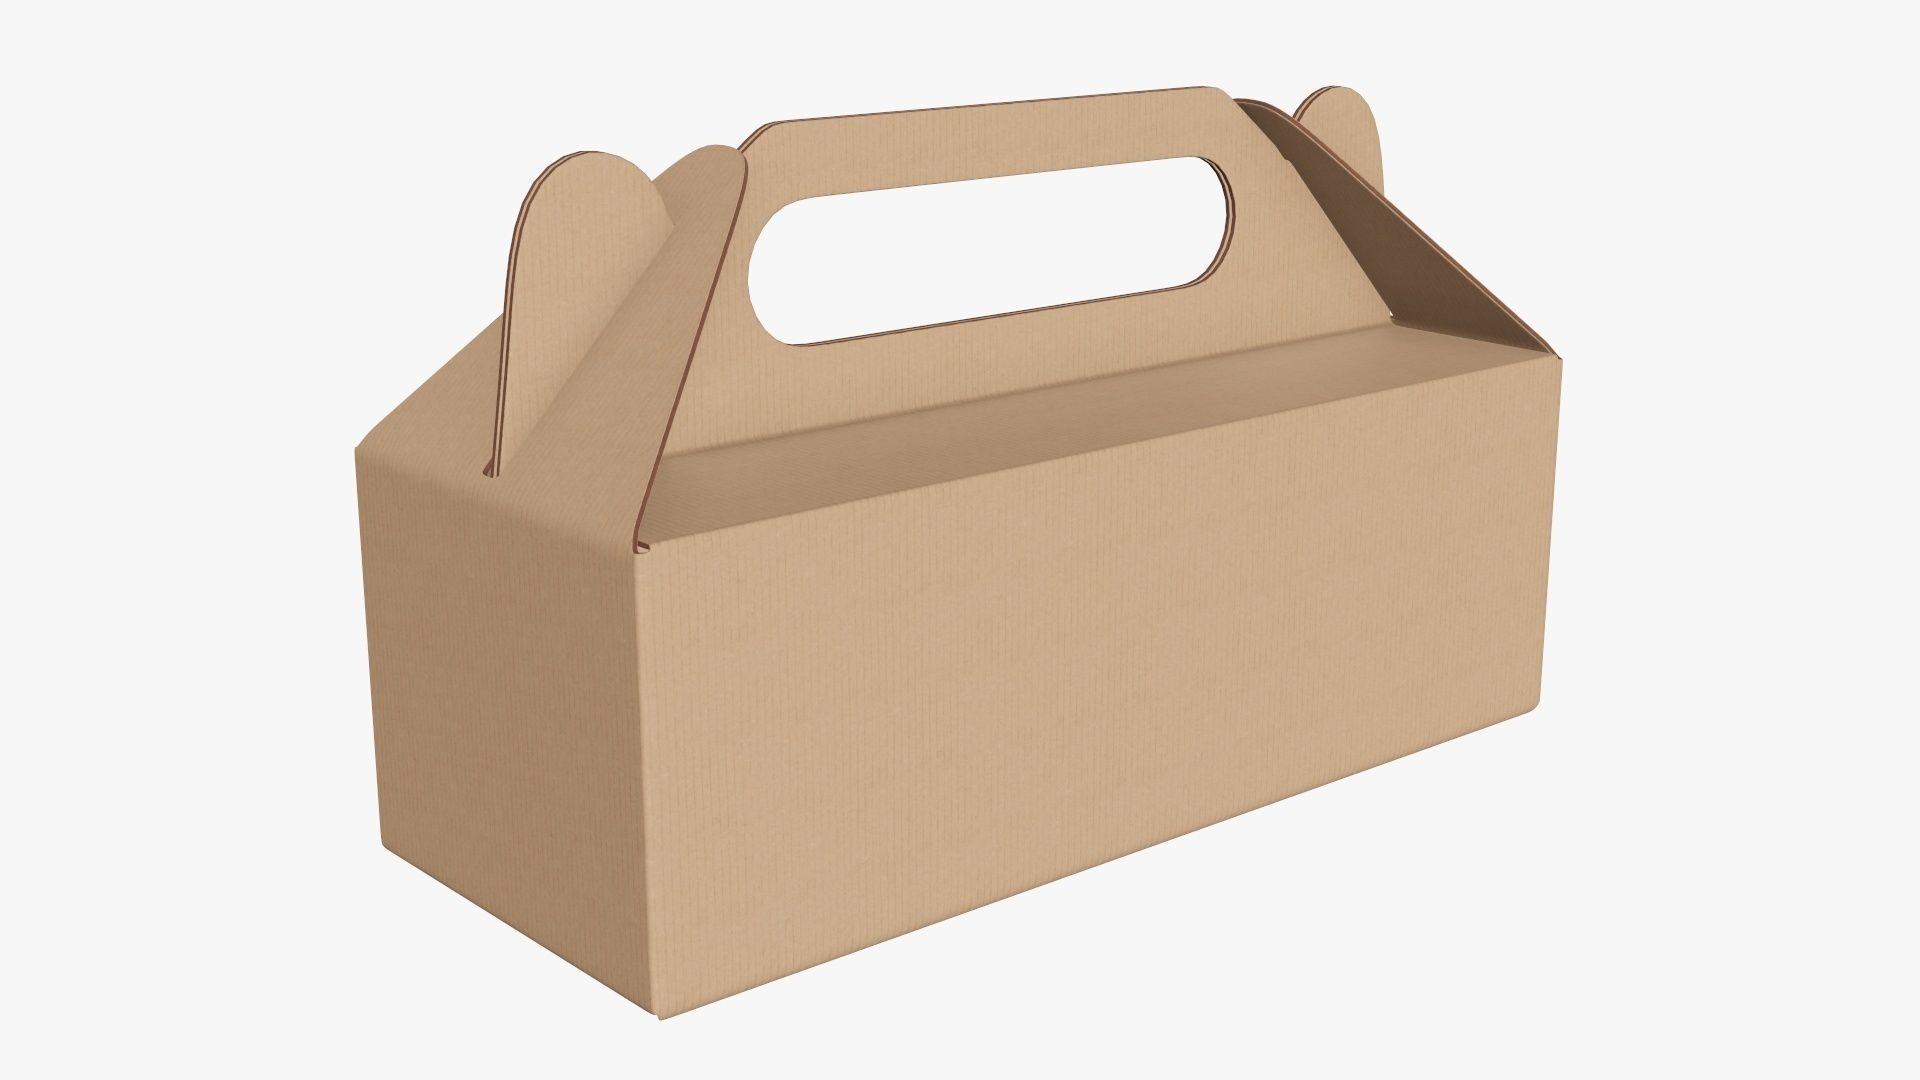 Gable box cardboard food packing 04